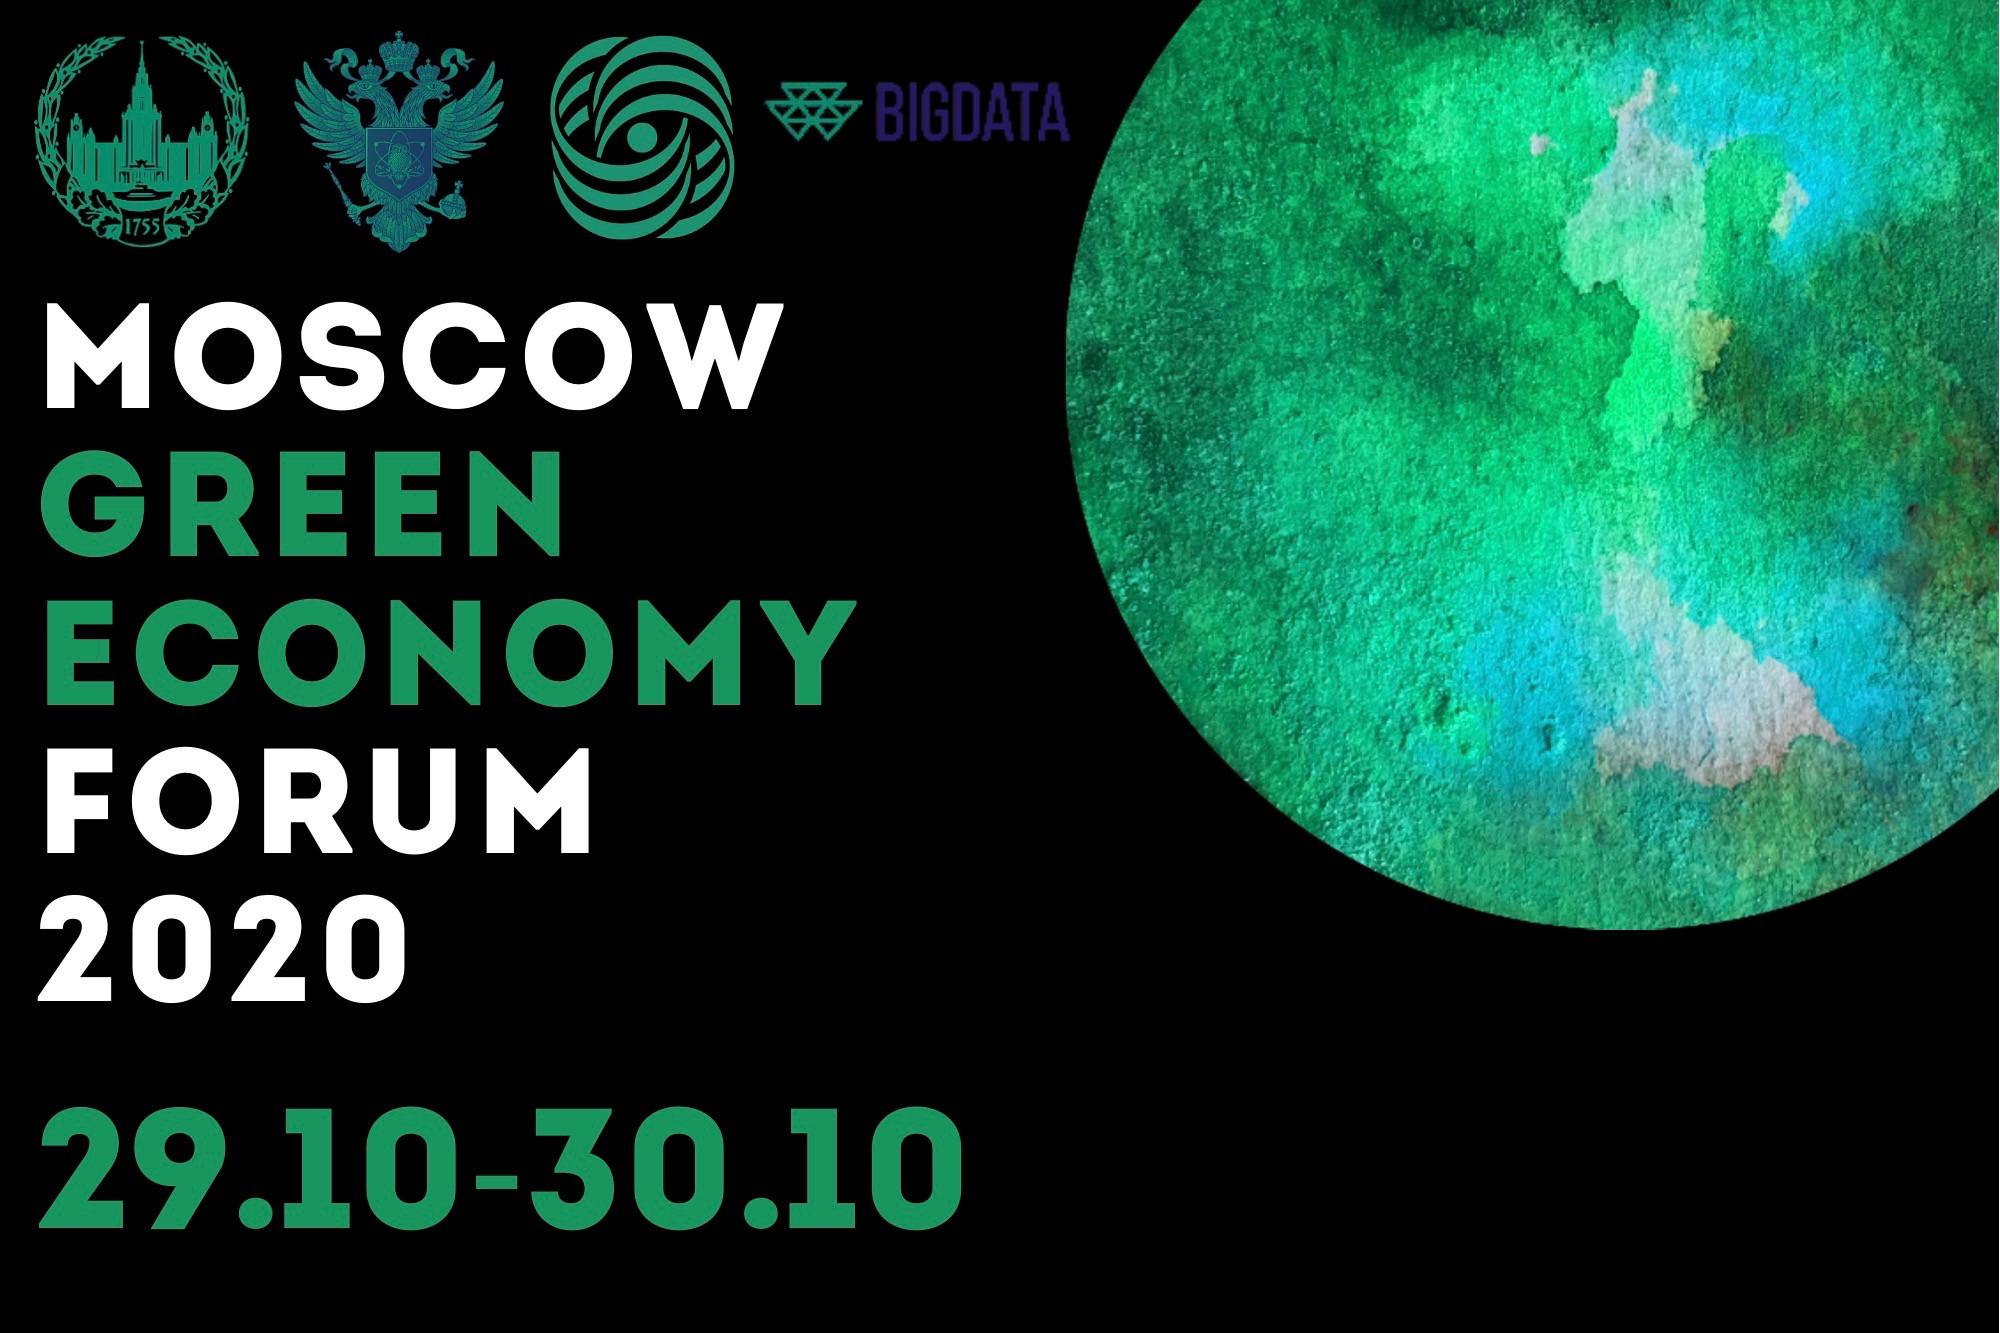 Moscow green economy forum 2020. МГУ. Центр компетенций НТИ по большим данным. НЦЦЭ МГУ